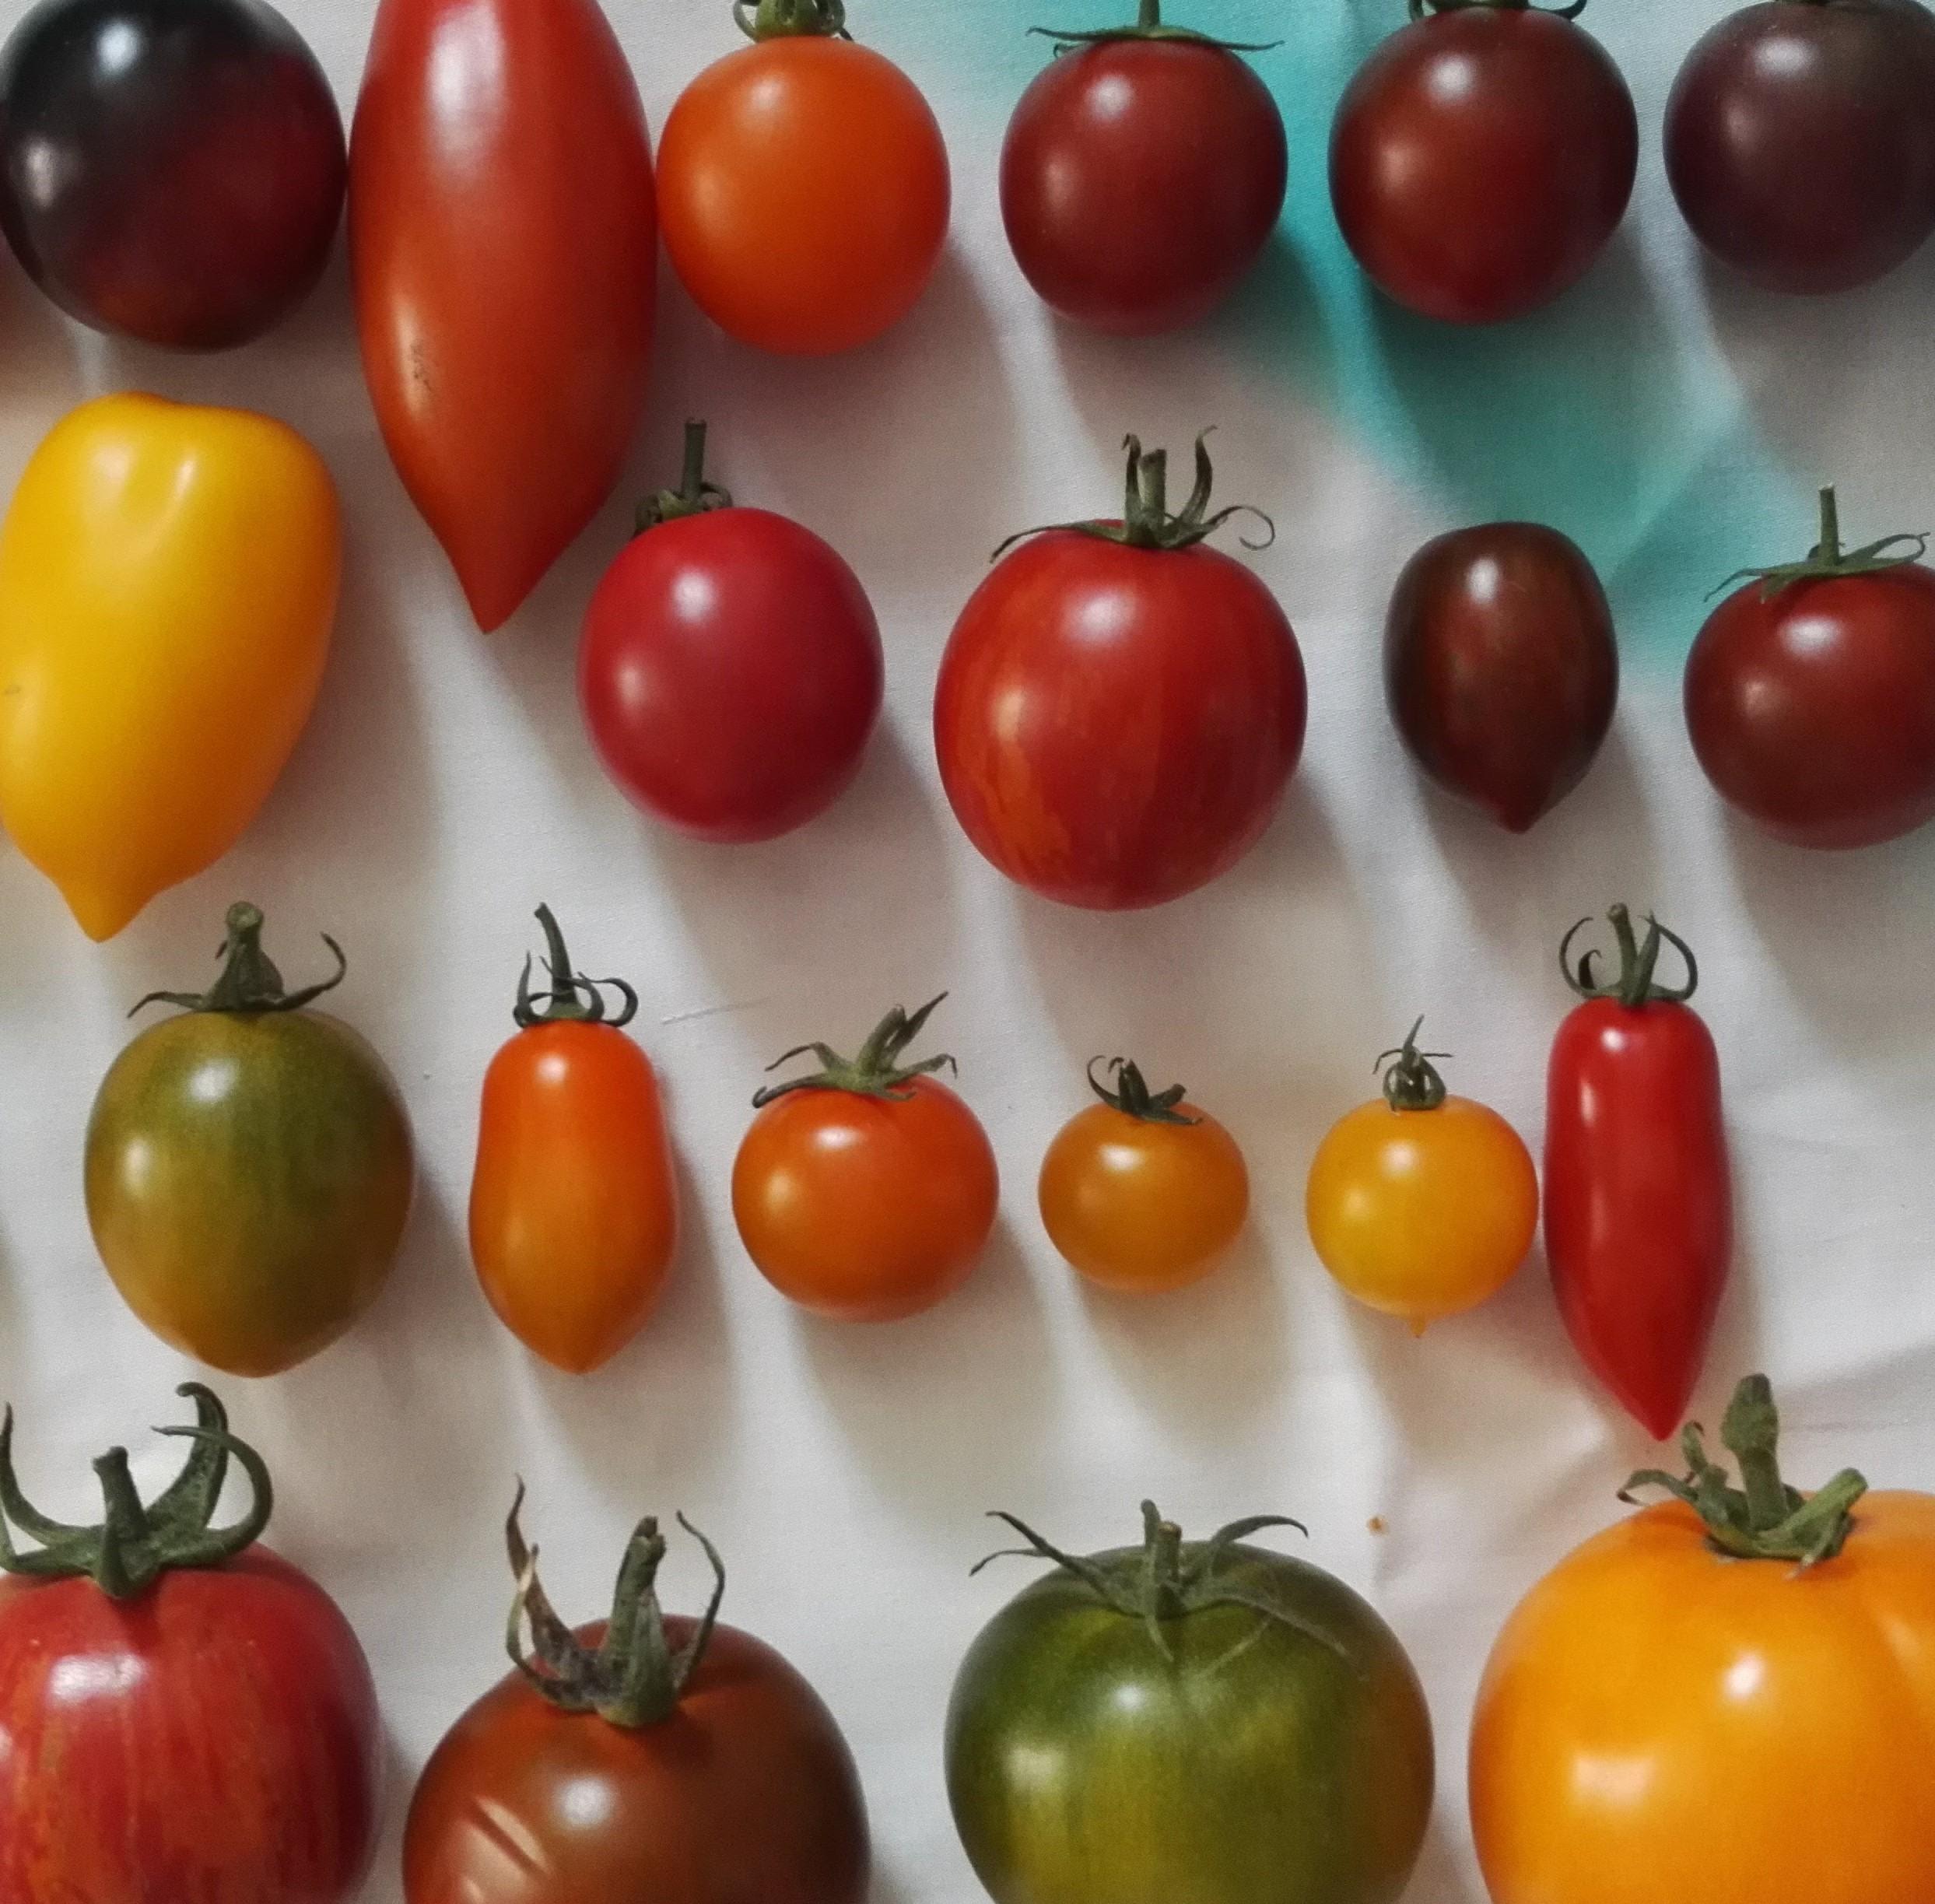 Smakjuryn – fokus på tomat